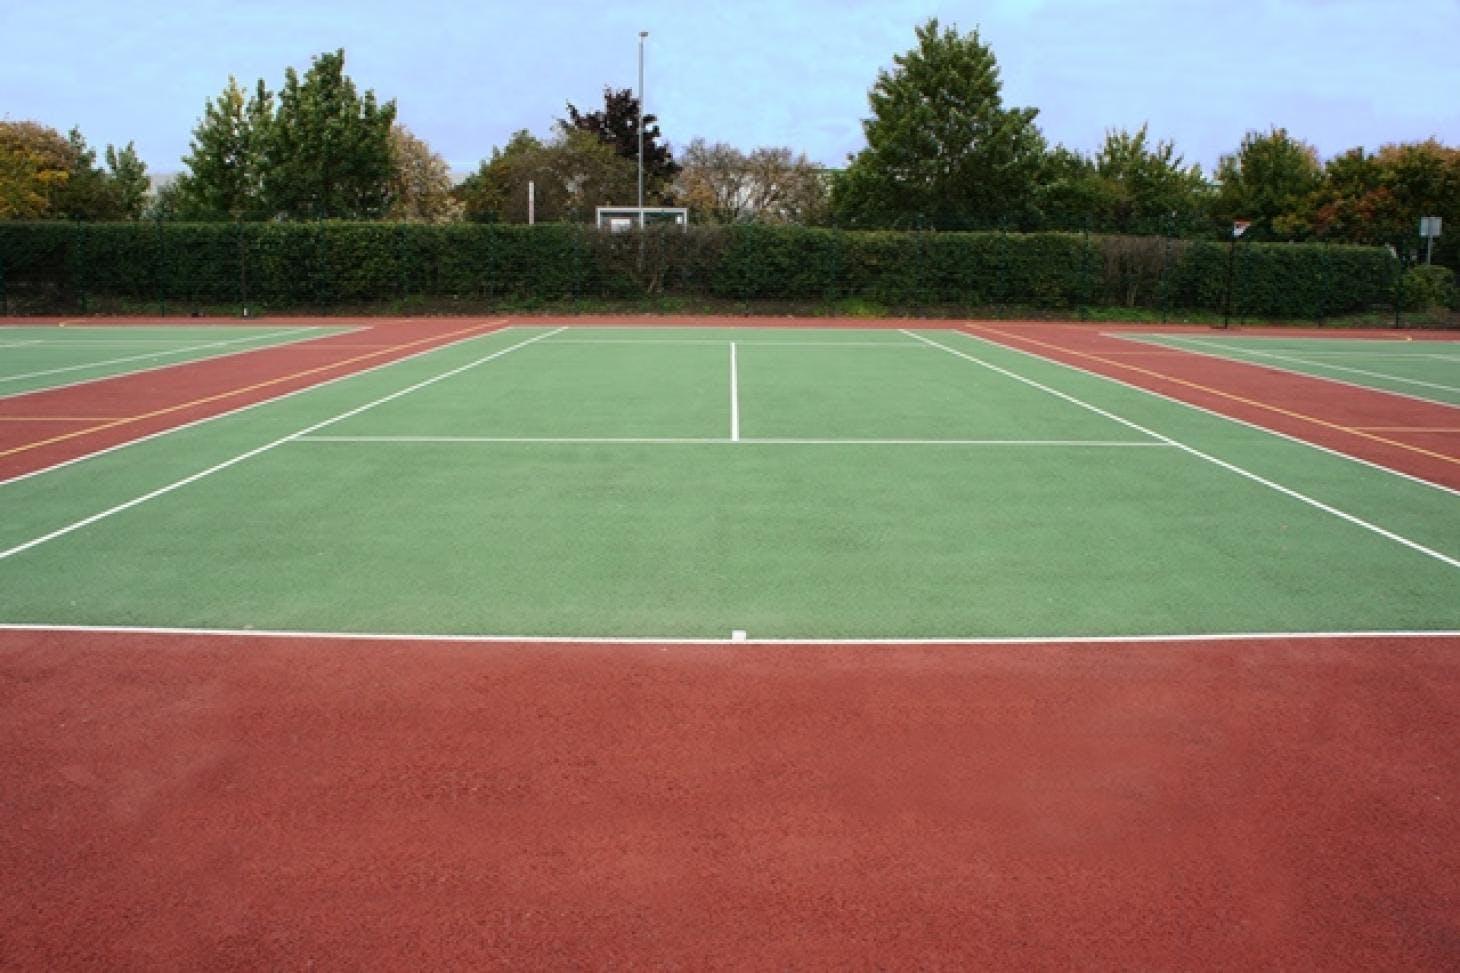 Lealands High School Outdoor | Hard (macadam) tennis court